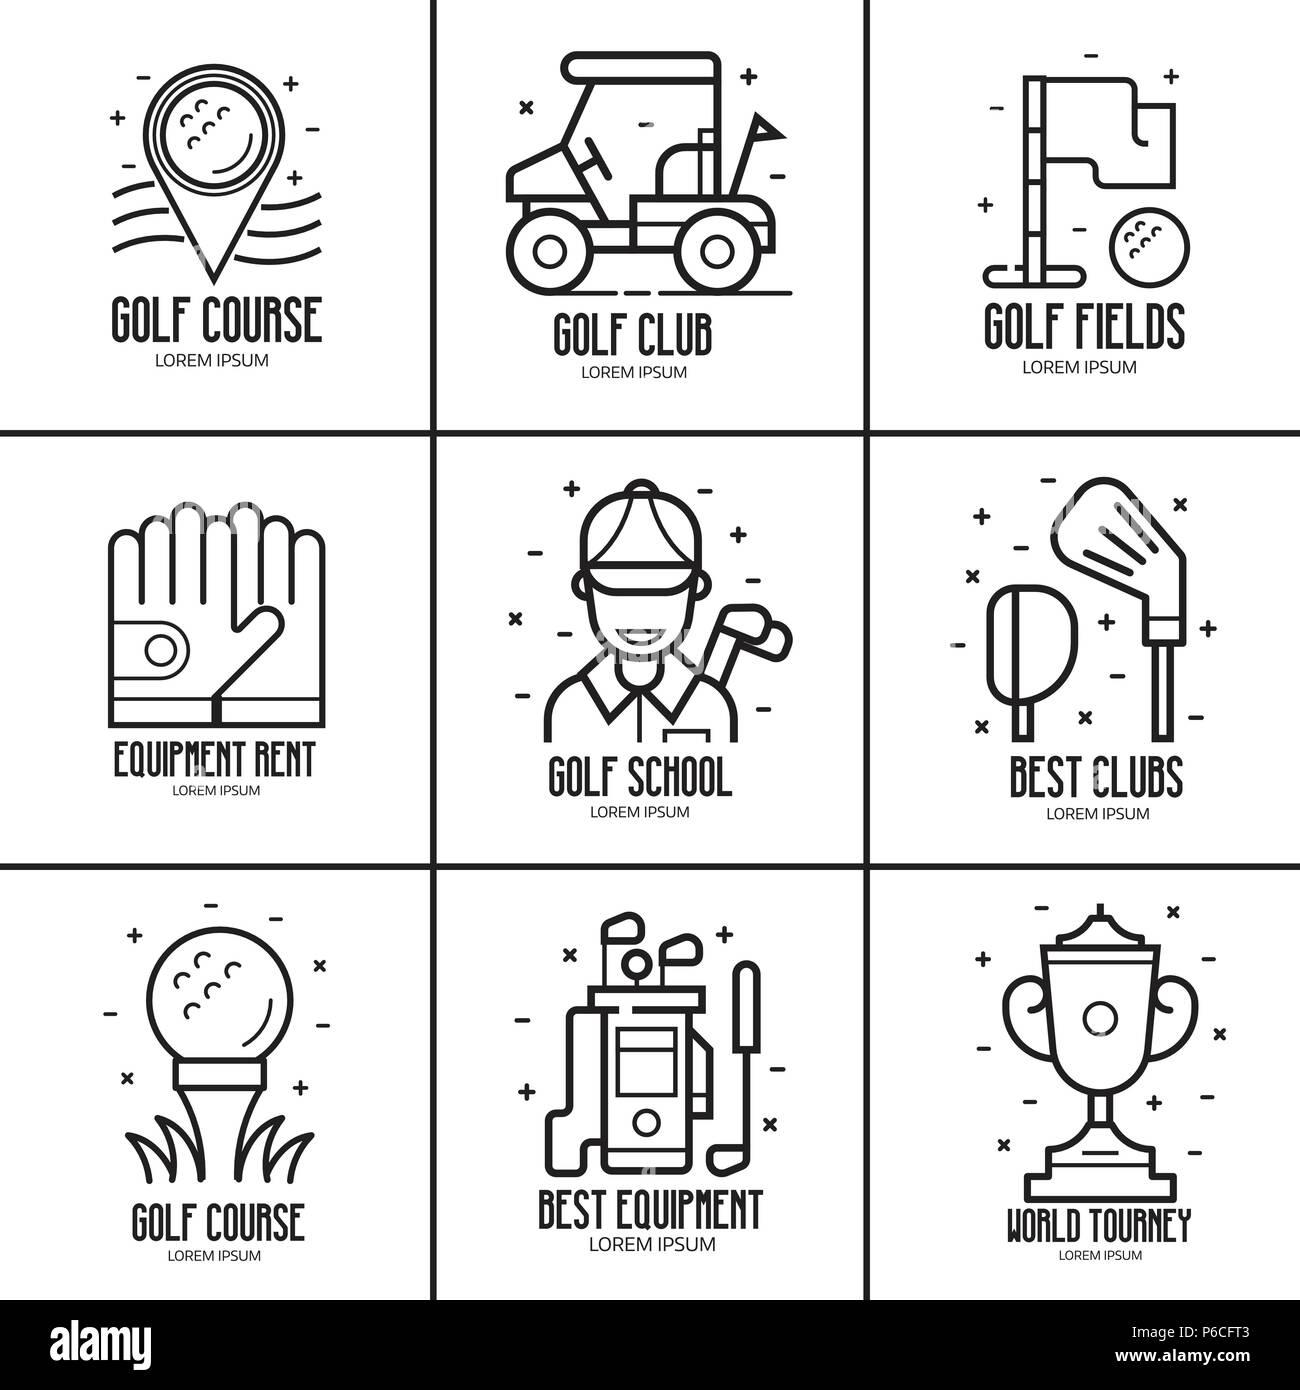 Golf Logotypes and Emblems - Stock Image